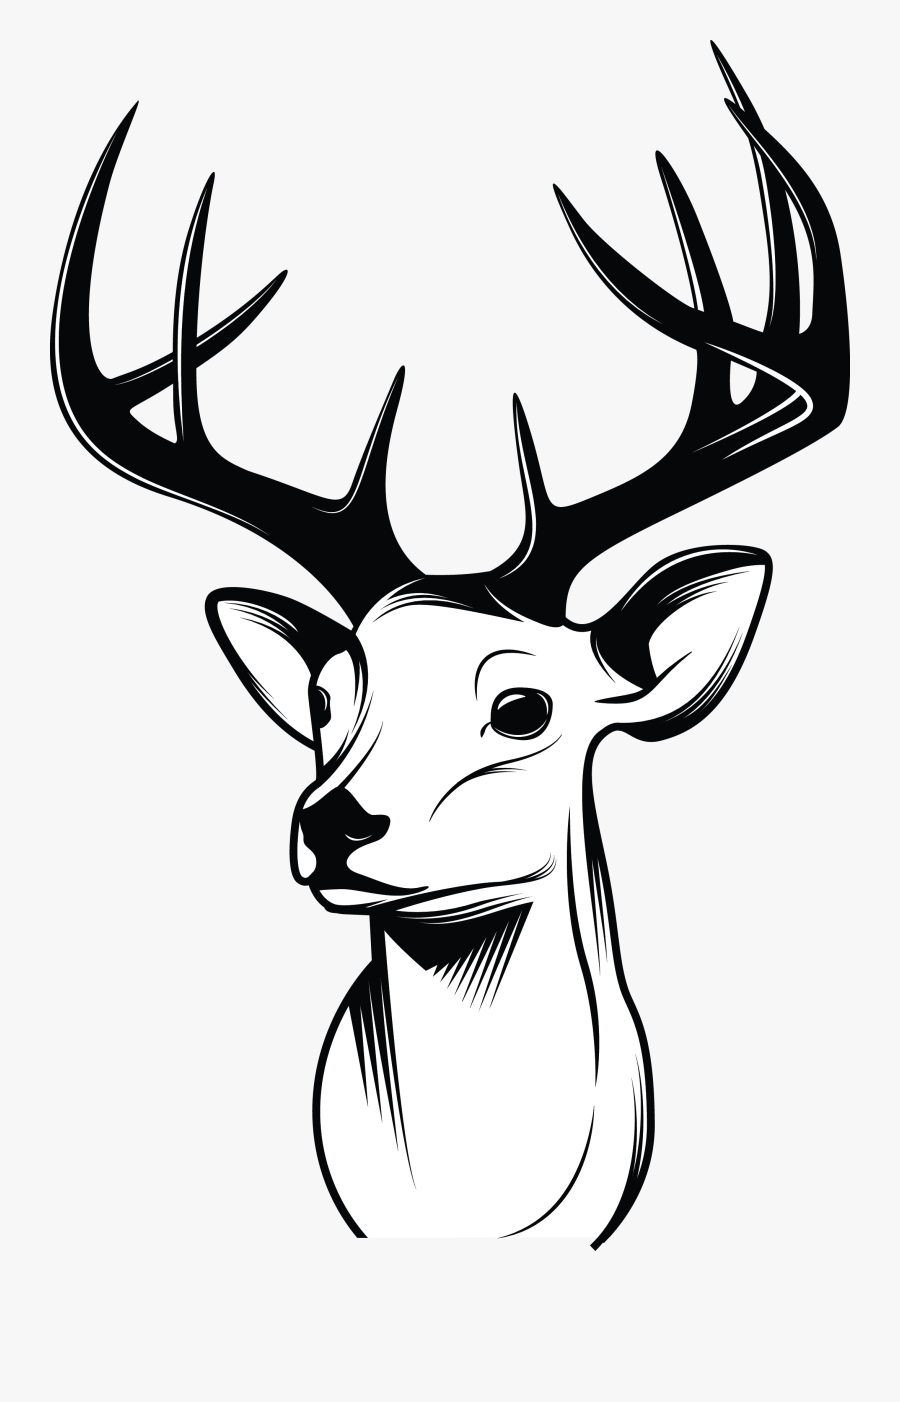 Deer Face Drawing Cartoon , Transparent Cartoons - Simple Easy Deer Drawings, Transparent Clipart